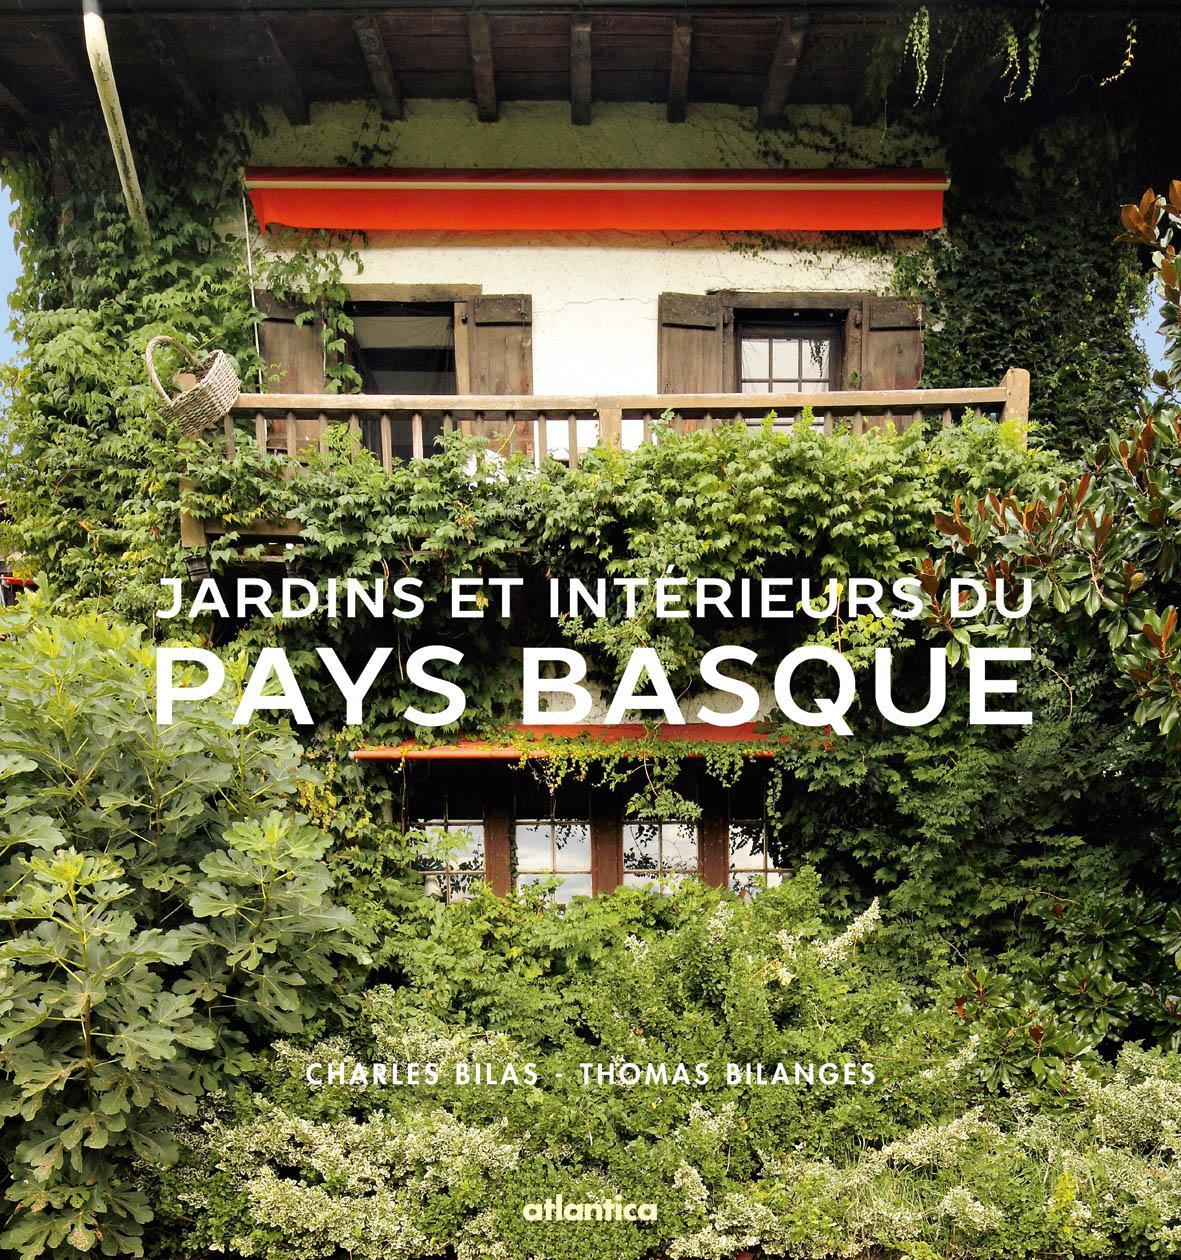 jardins et int rieurs du pays basque charles bilas thomas bilanges livre france loisirs. Black Bedroom Furniture Sets. Home Design Ideas